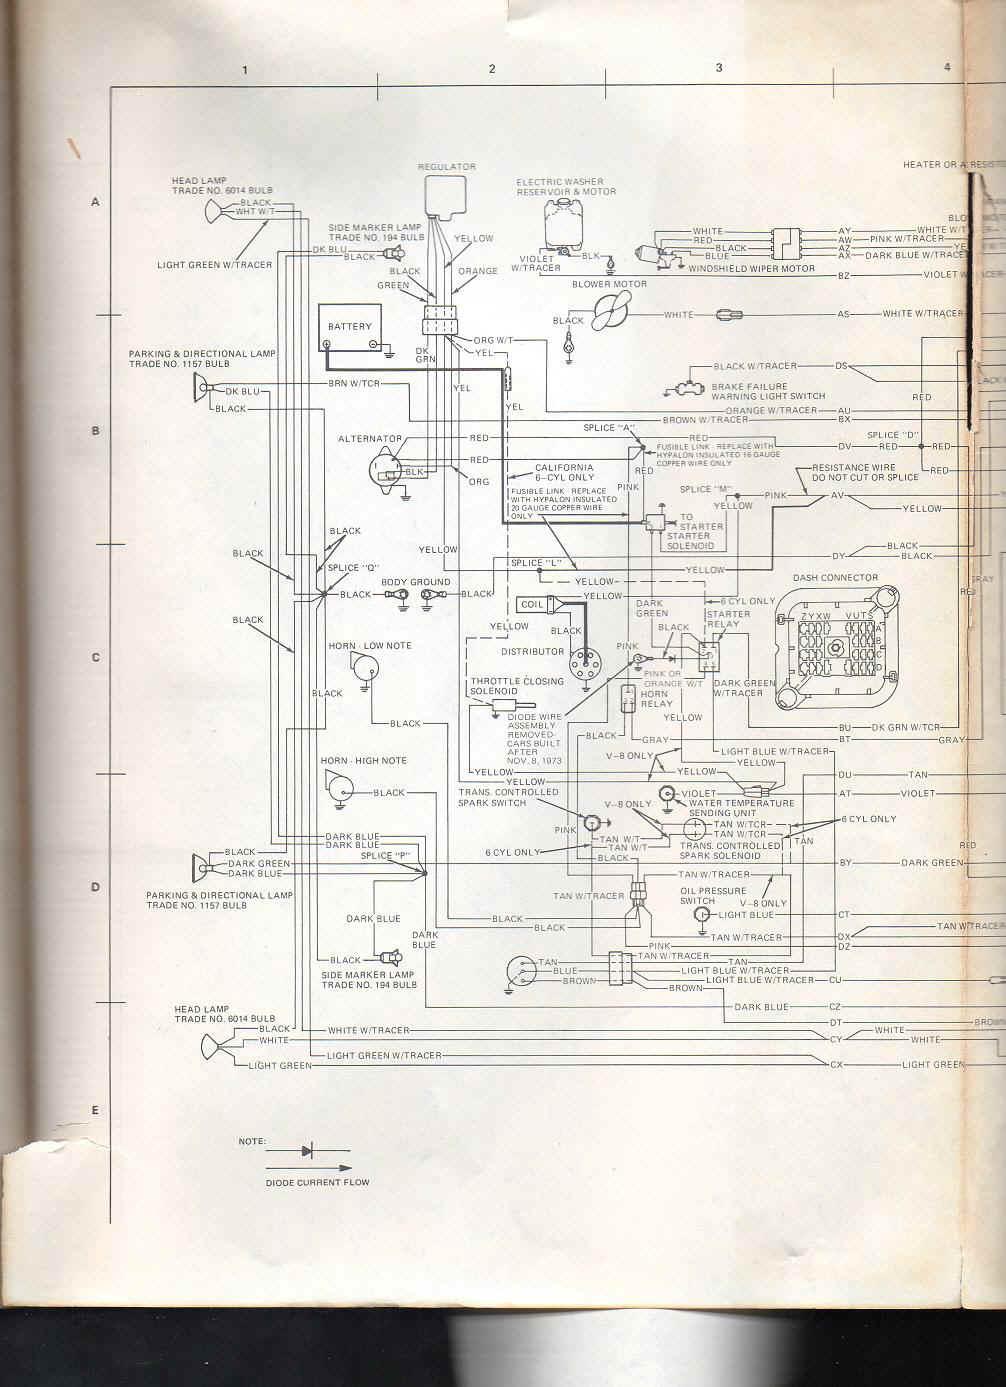 amx wiring diagram wiring diagrams lol